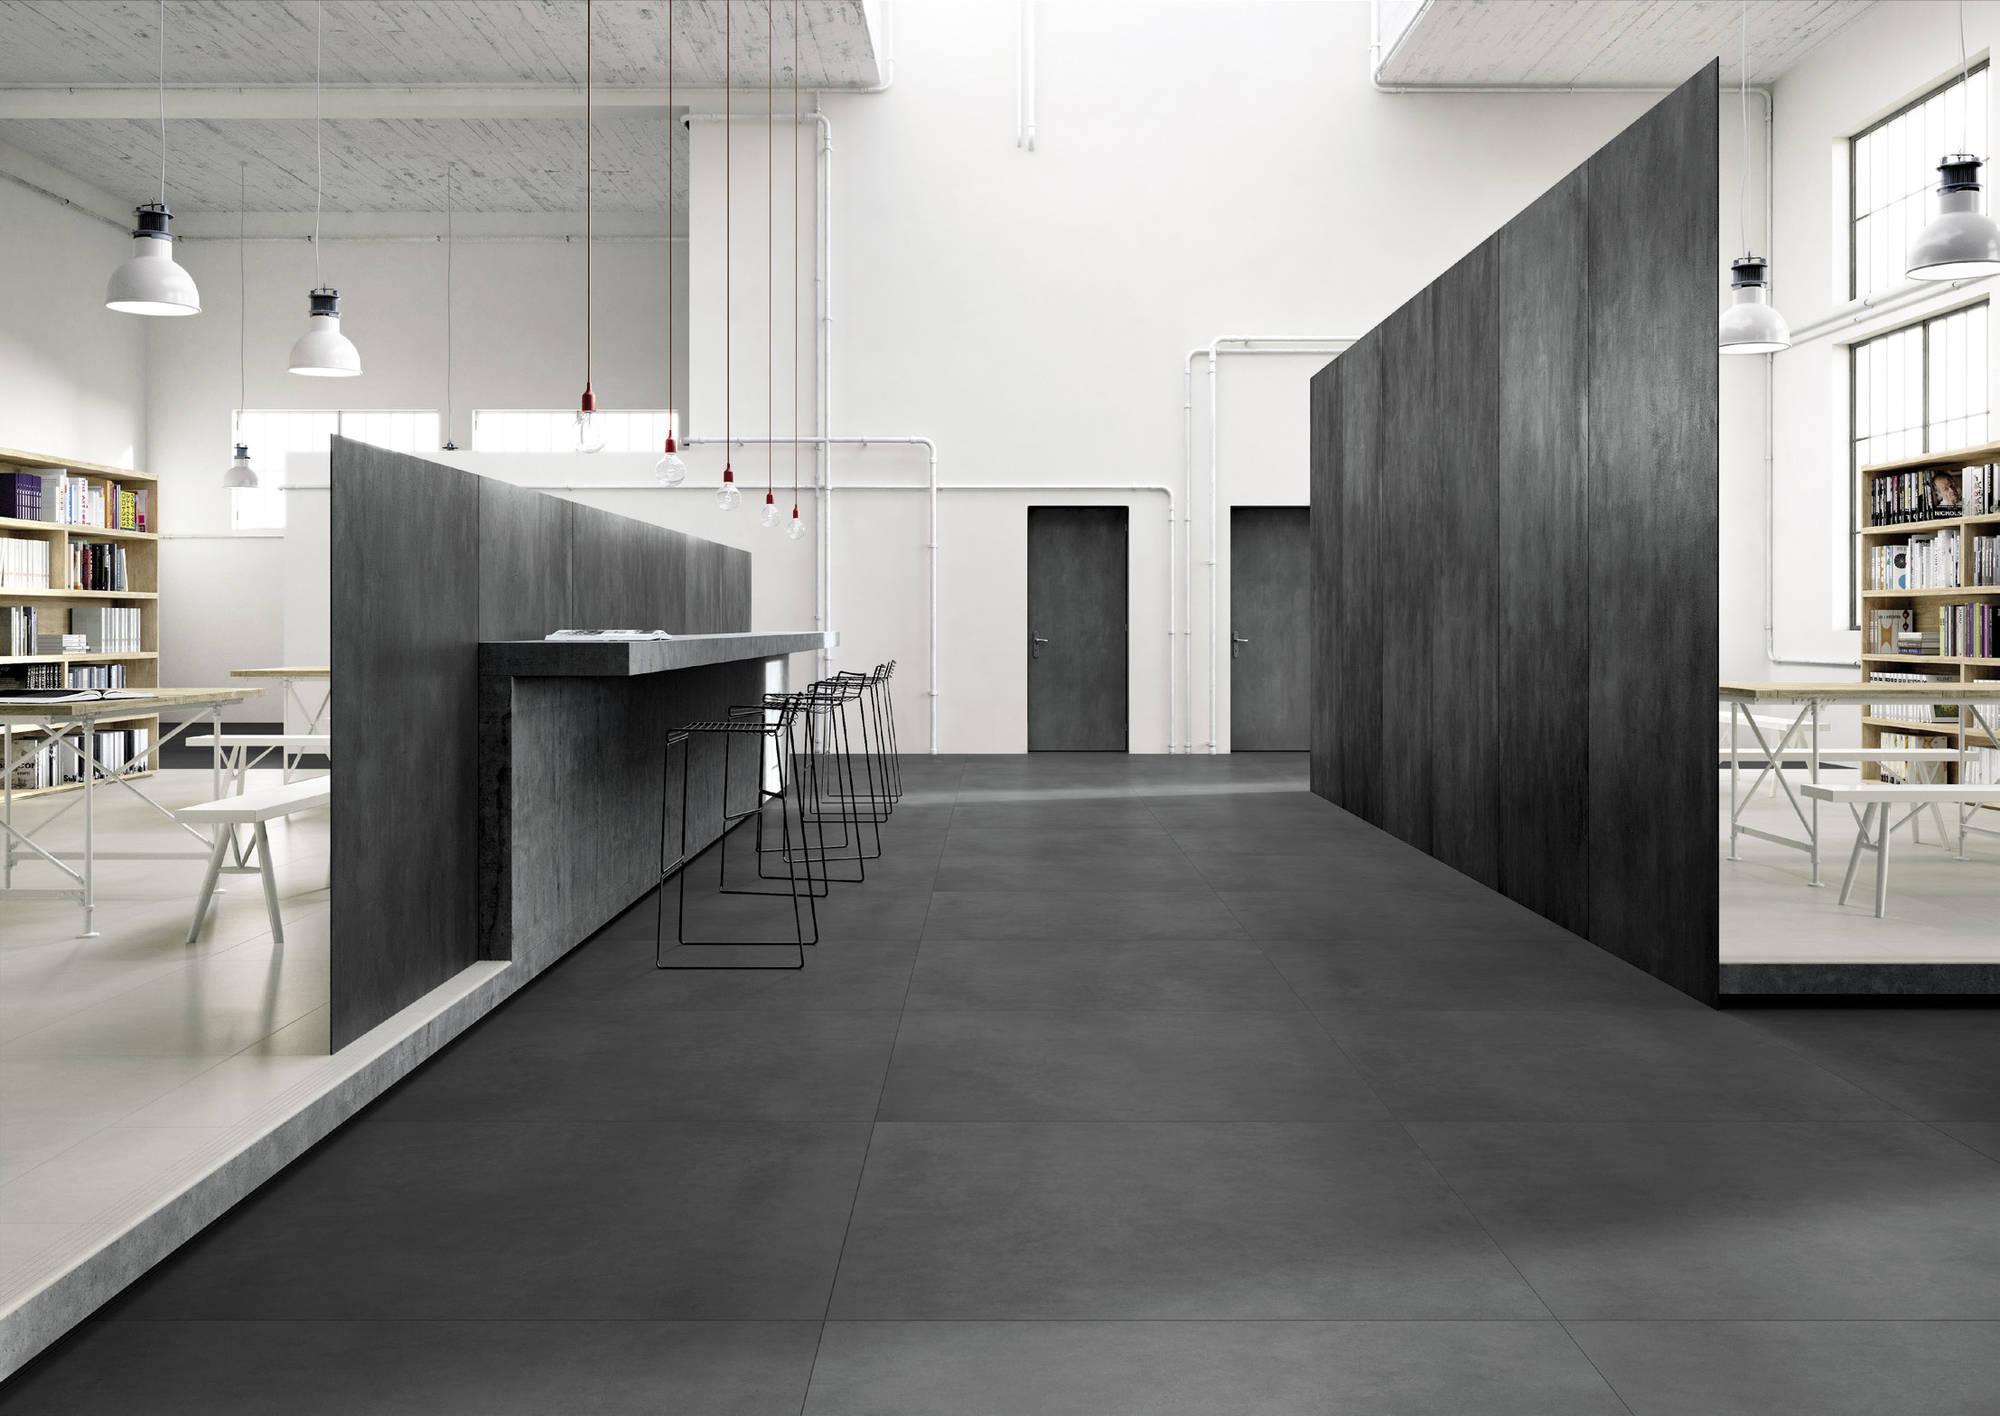 Vloertegel Imola Micron 2.0 30x60x- cm Black N 0,9M2